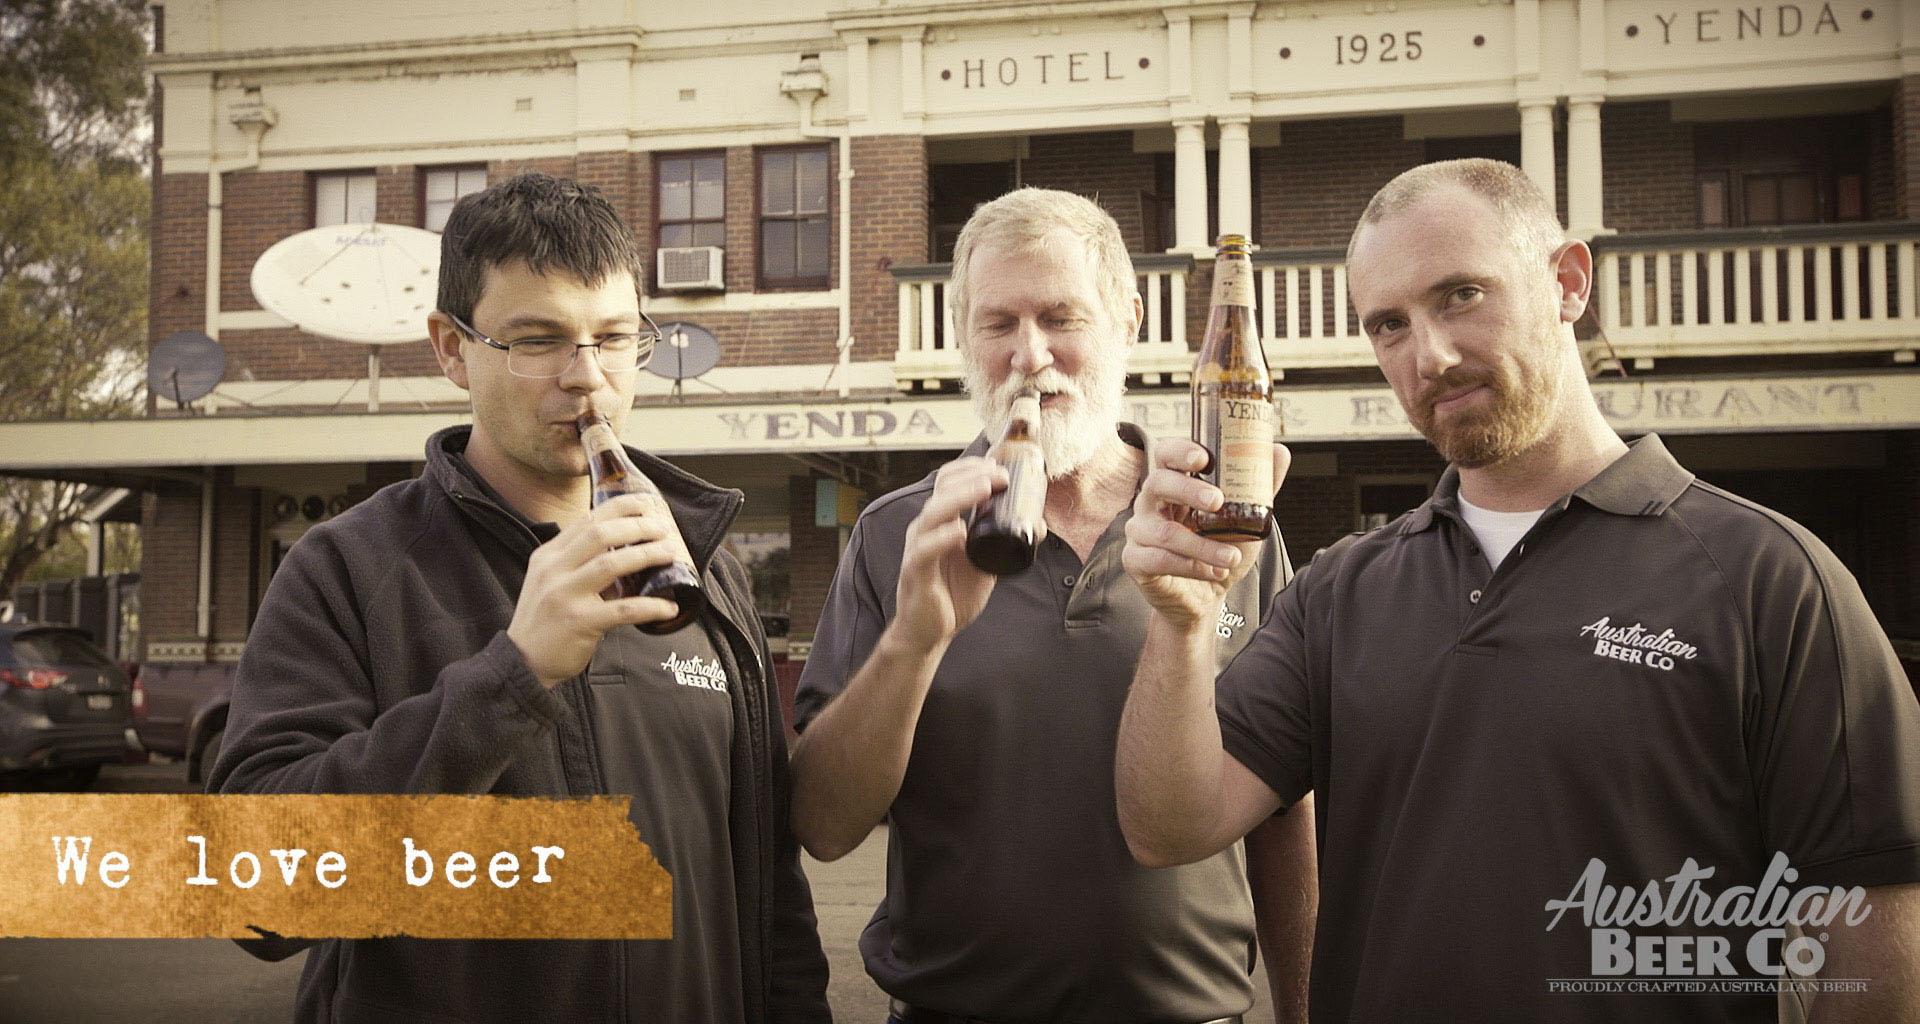 AustralianBeerCompany_beer_bottles_slideshow_one.jpg